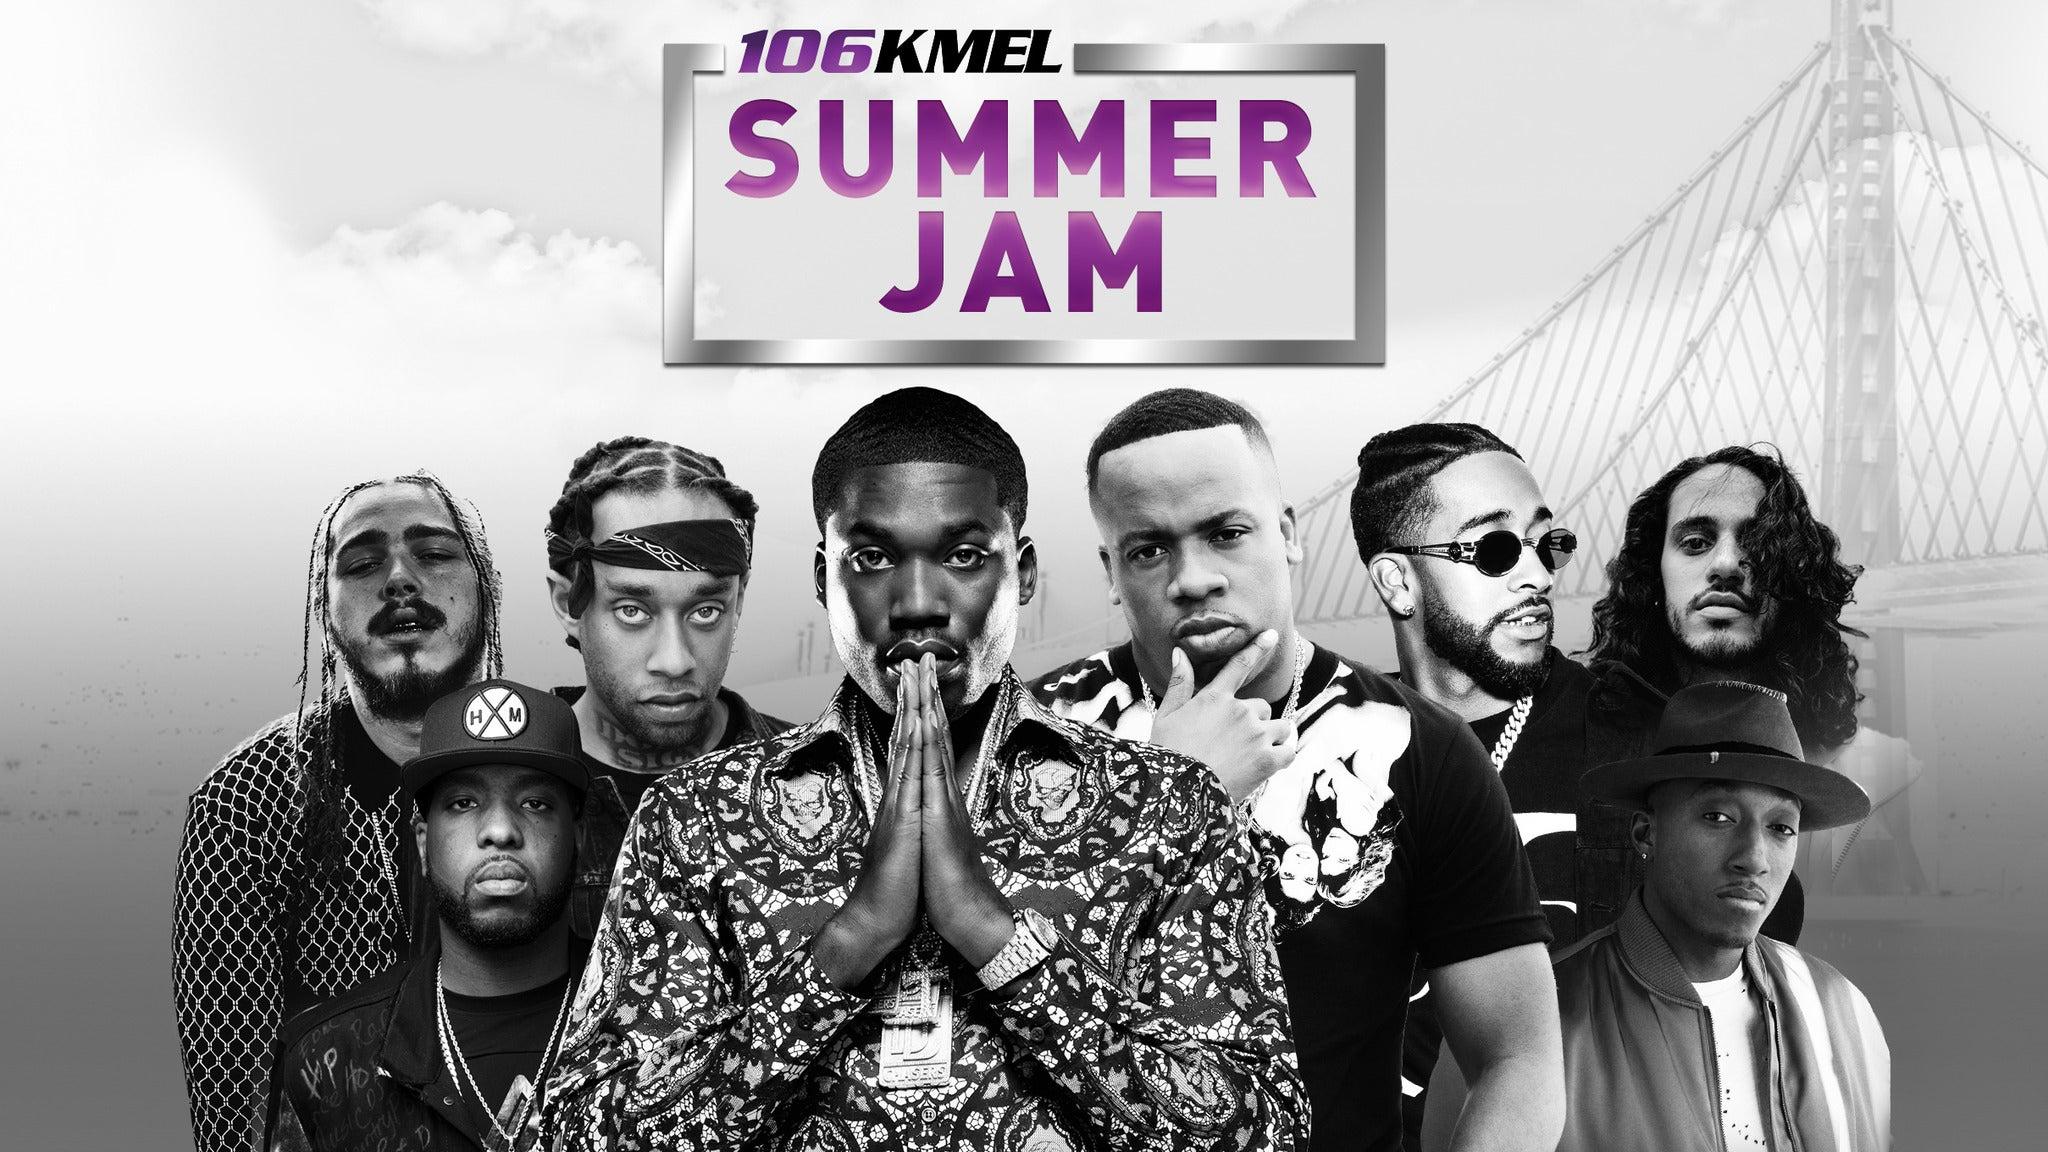 KMEL Presents Summer Jam 2017 at Oracle Arena